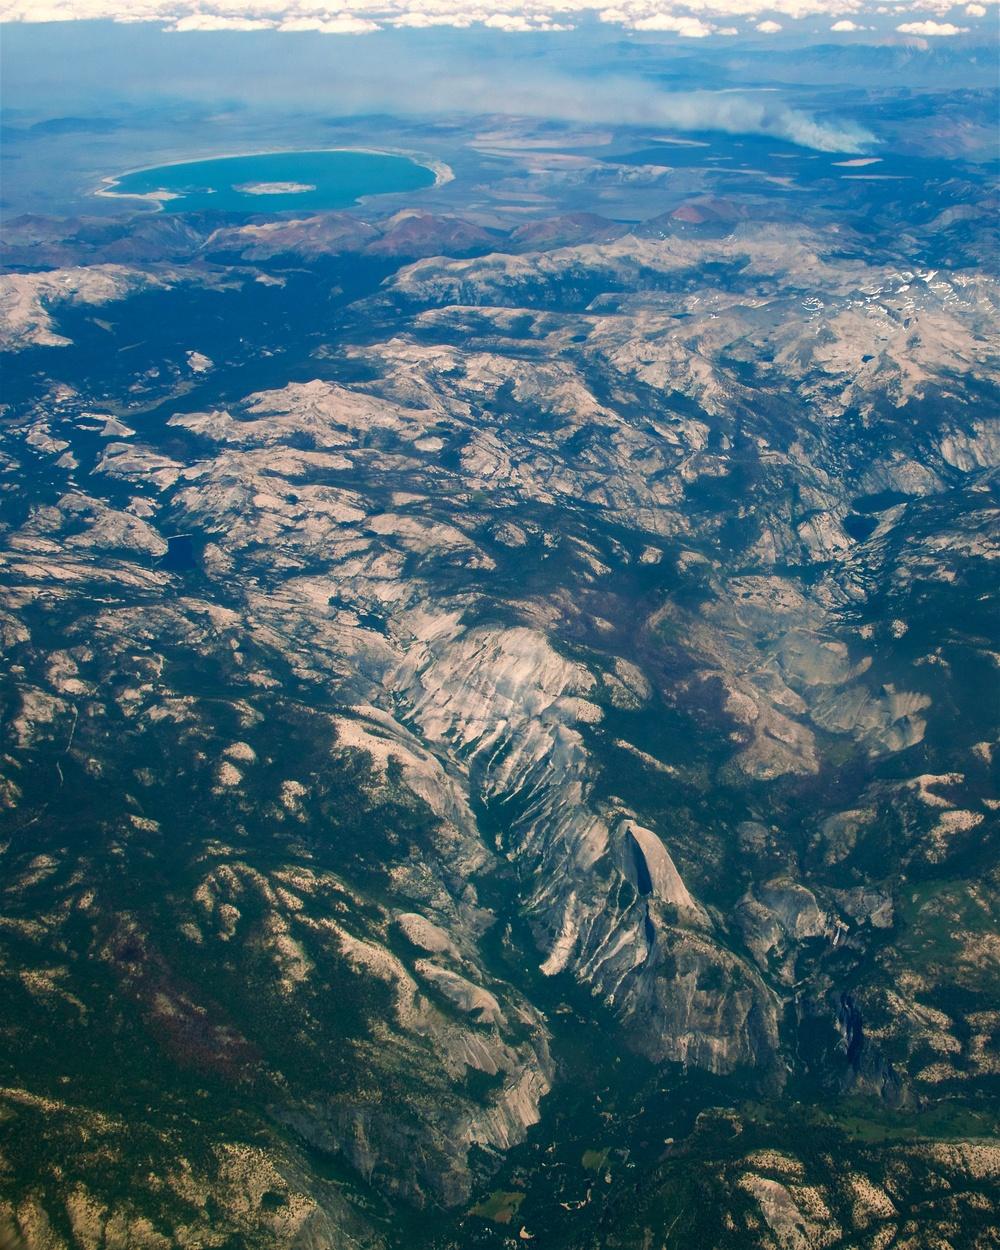 Yosemite National Park (with Half Dome), Mono Lake